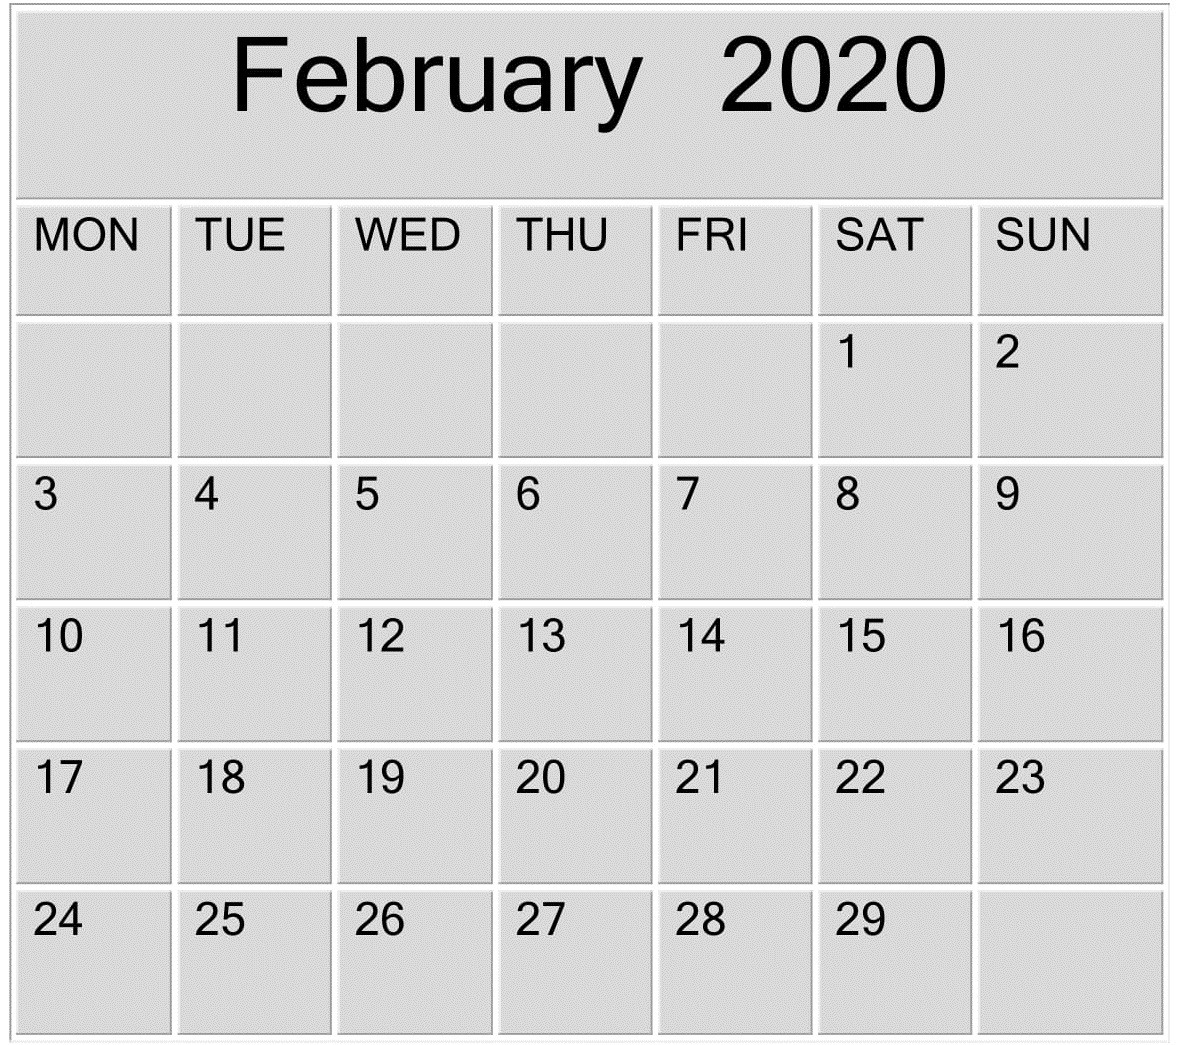 February 2020 Blank Calendar Word, Excel Template – Free-Microsoft Word Calendar Template 2020 Edit